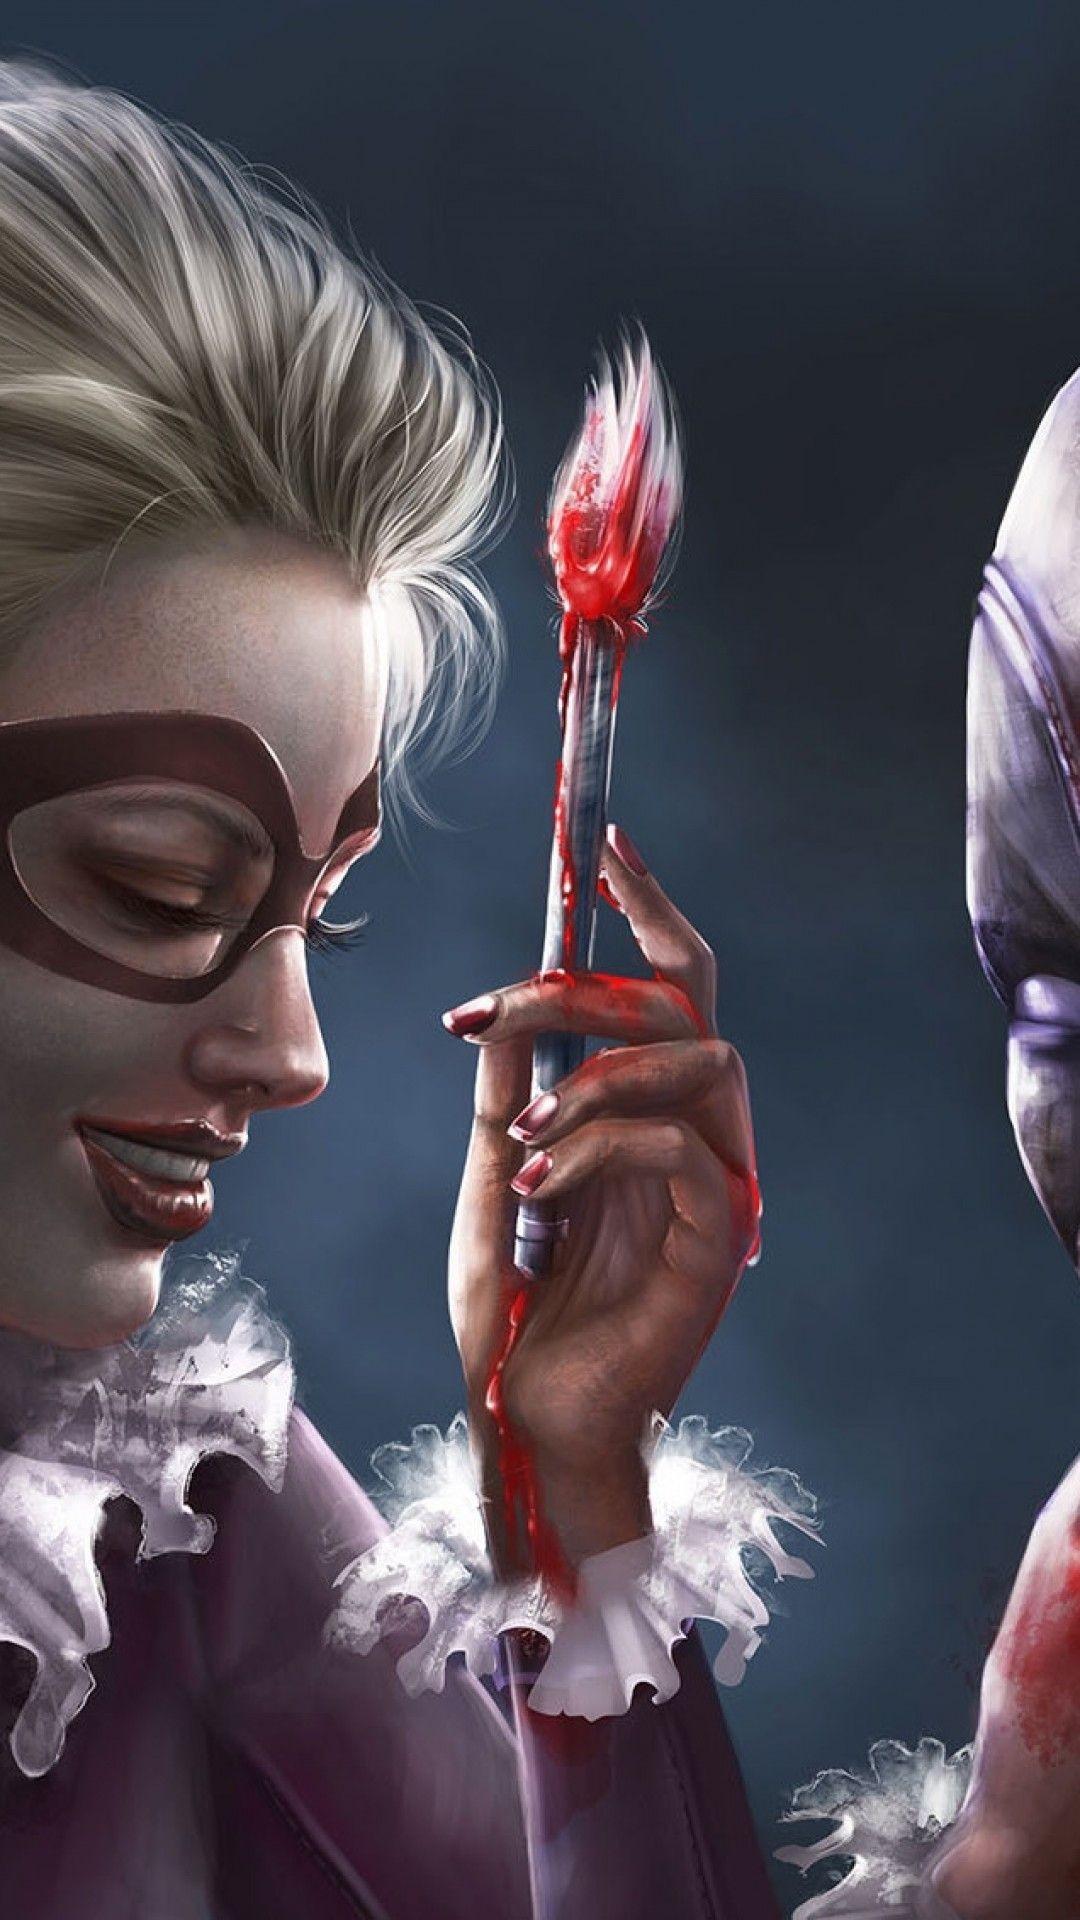 Wallpaper iphone harley quinn – Harley Quinn Deadpool Artwork Dc Universe  Marvel Universe. Download